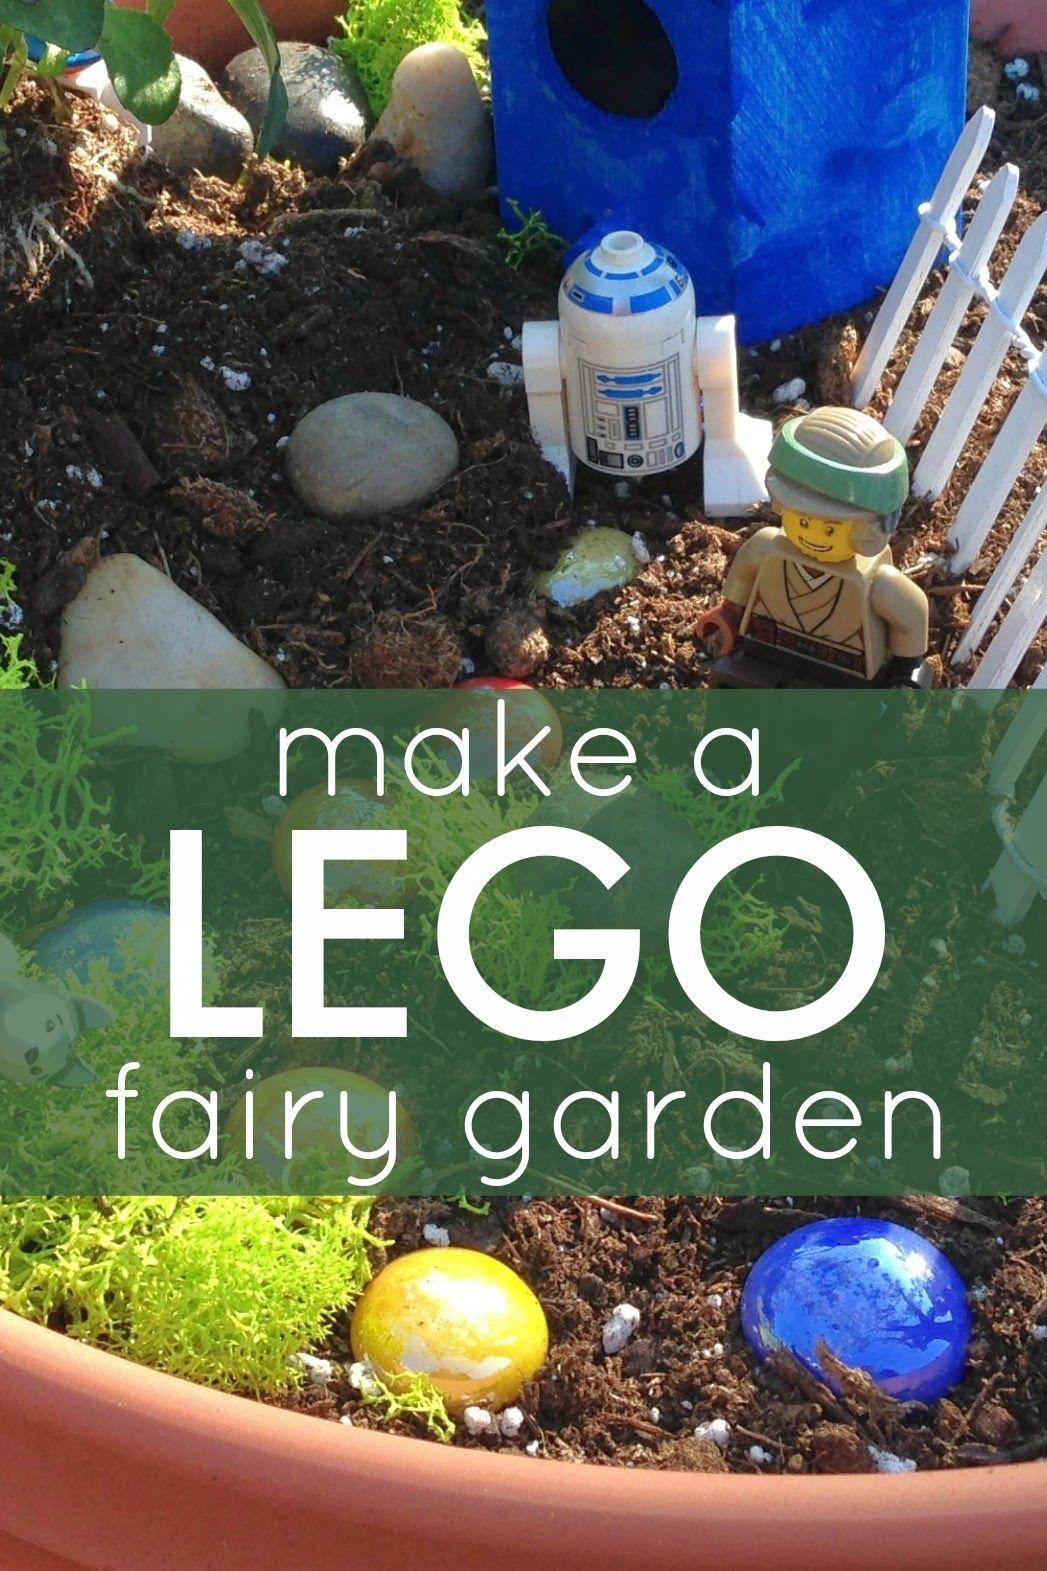 f03c7a7526b93511a6846f39f861ff2e - Fairy Gardens For Kids To Make